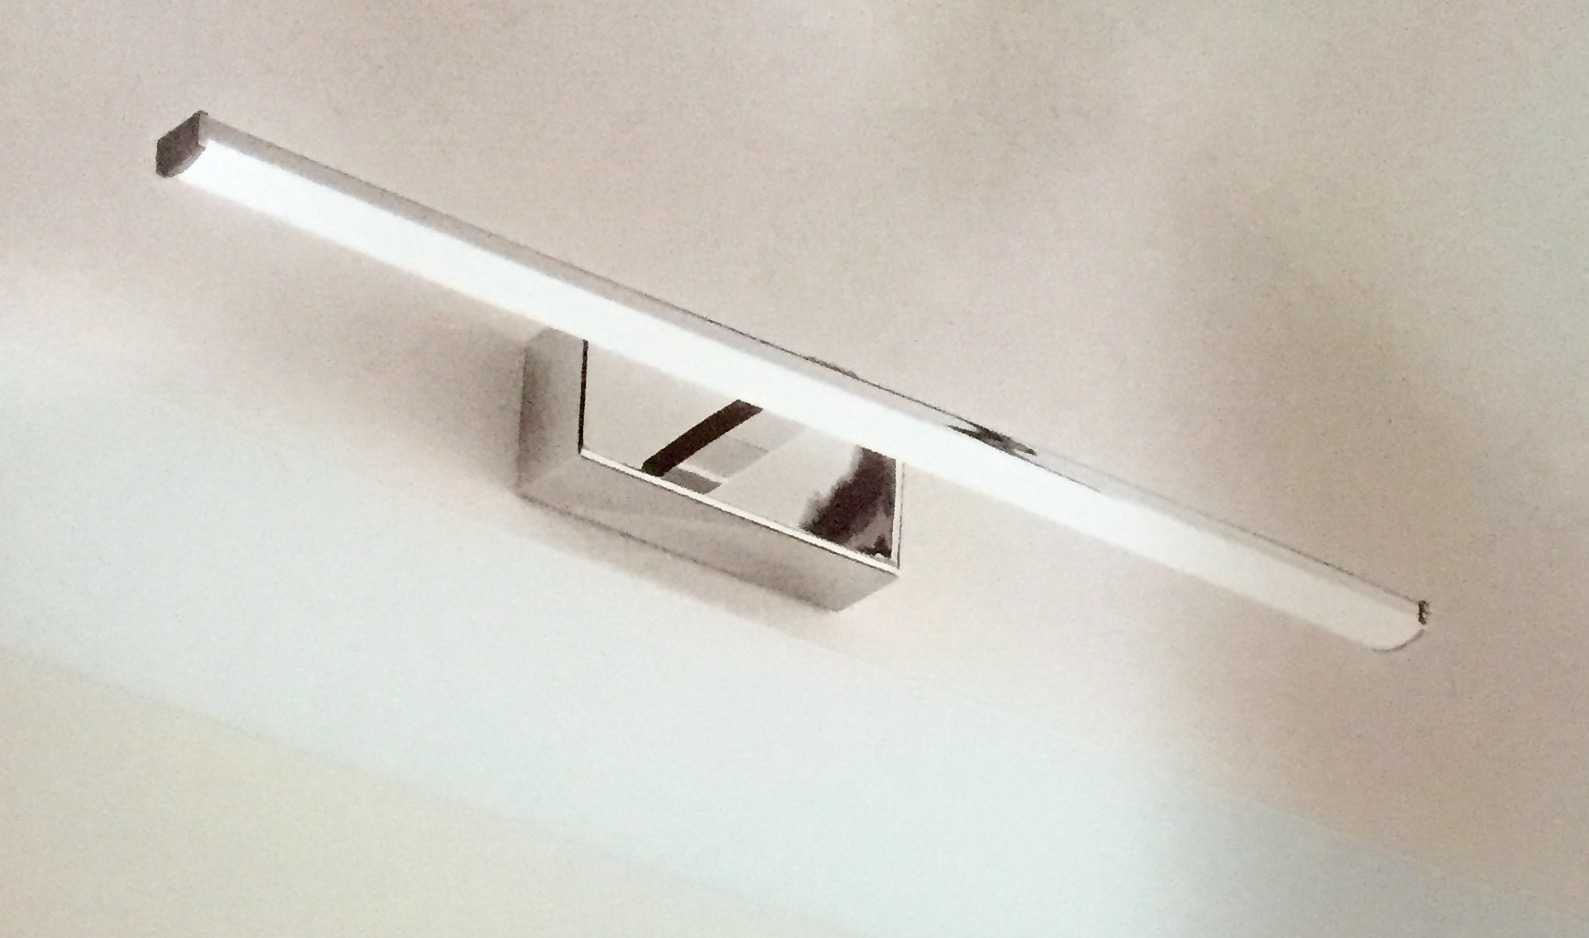 Illuminazione fabas luce nala 3361 21 138 metallo lampade da parete design illuminazione a - Lampade da parete design ...